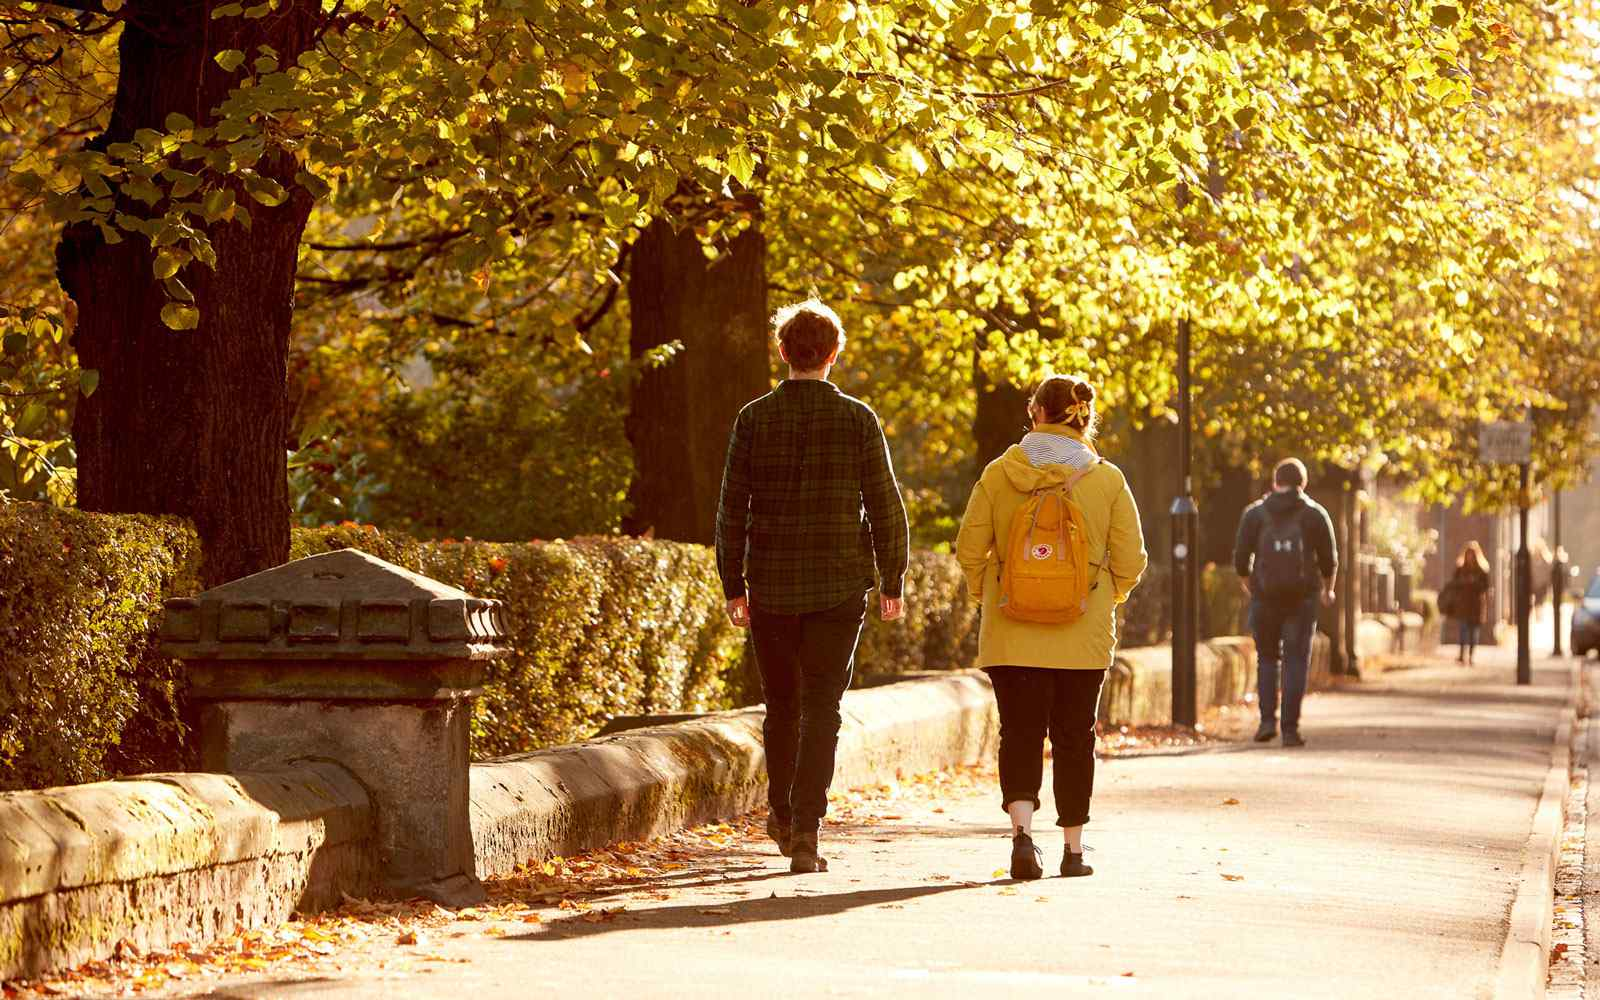 Walking down Lord Mayors walk